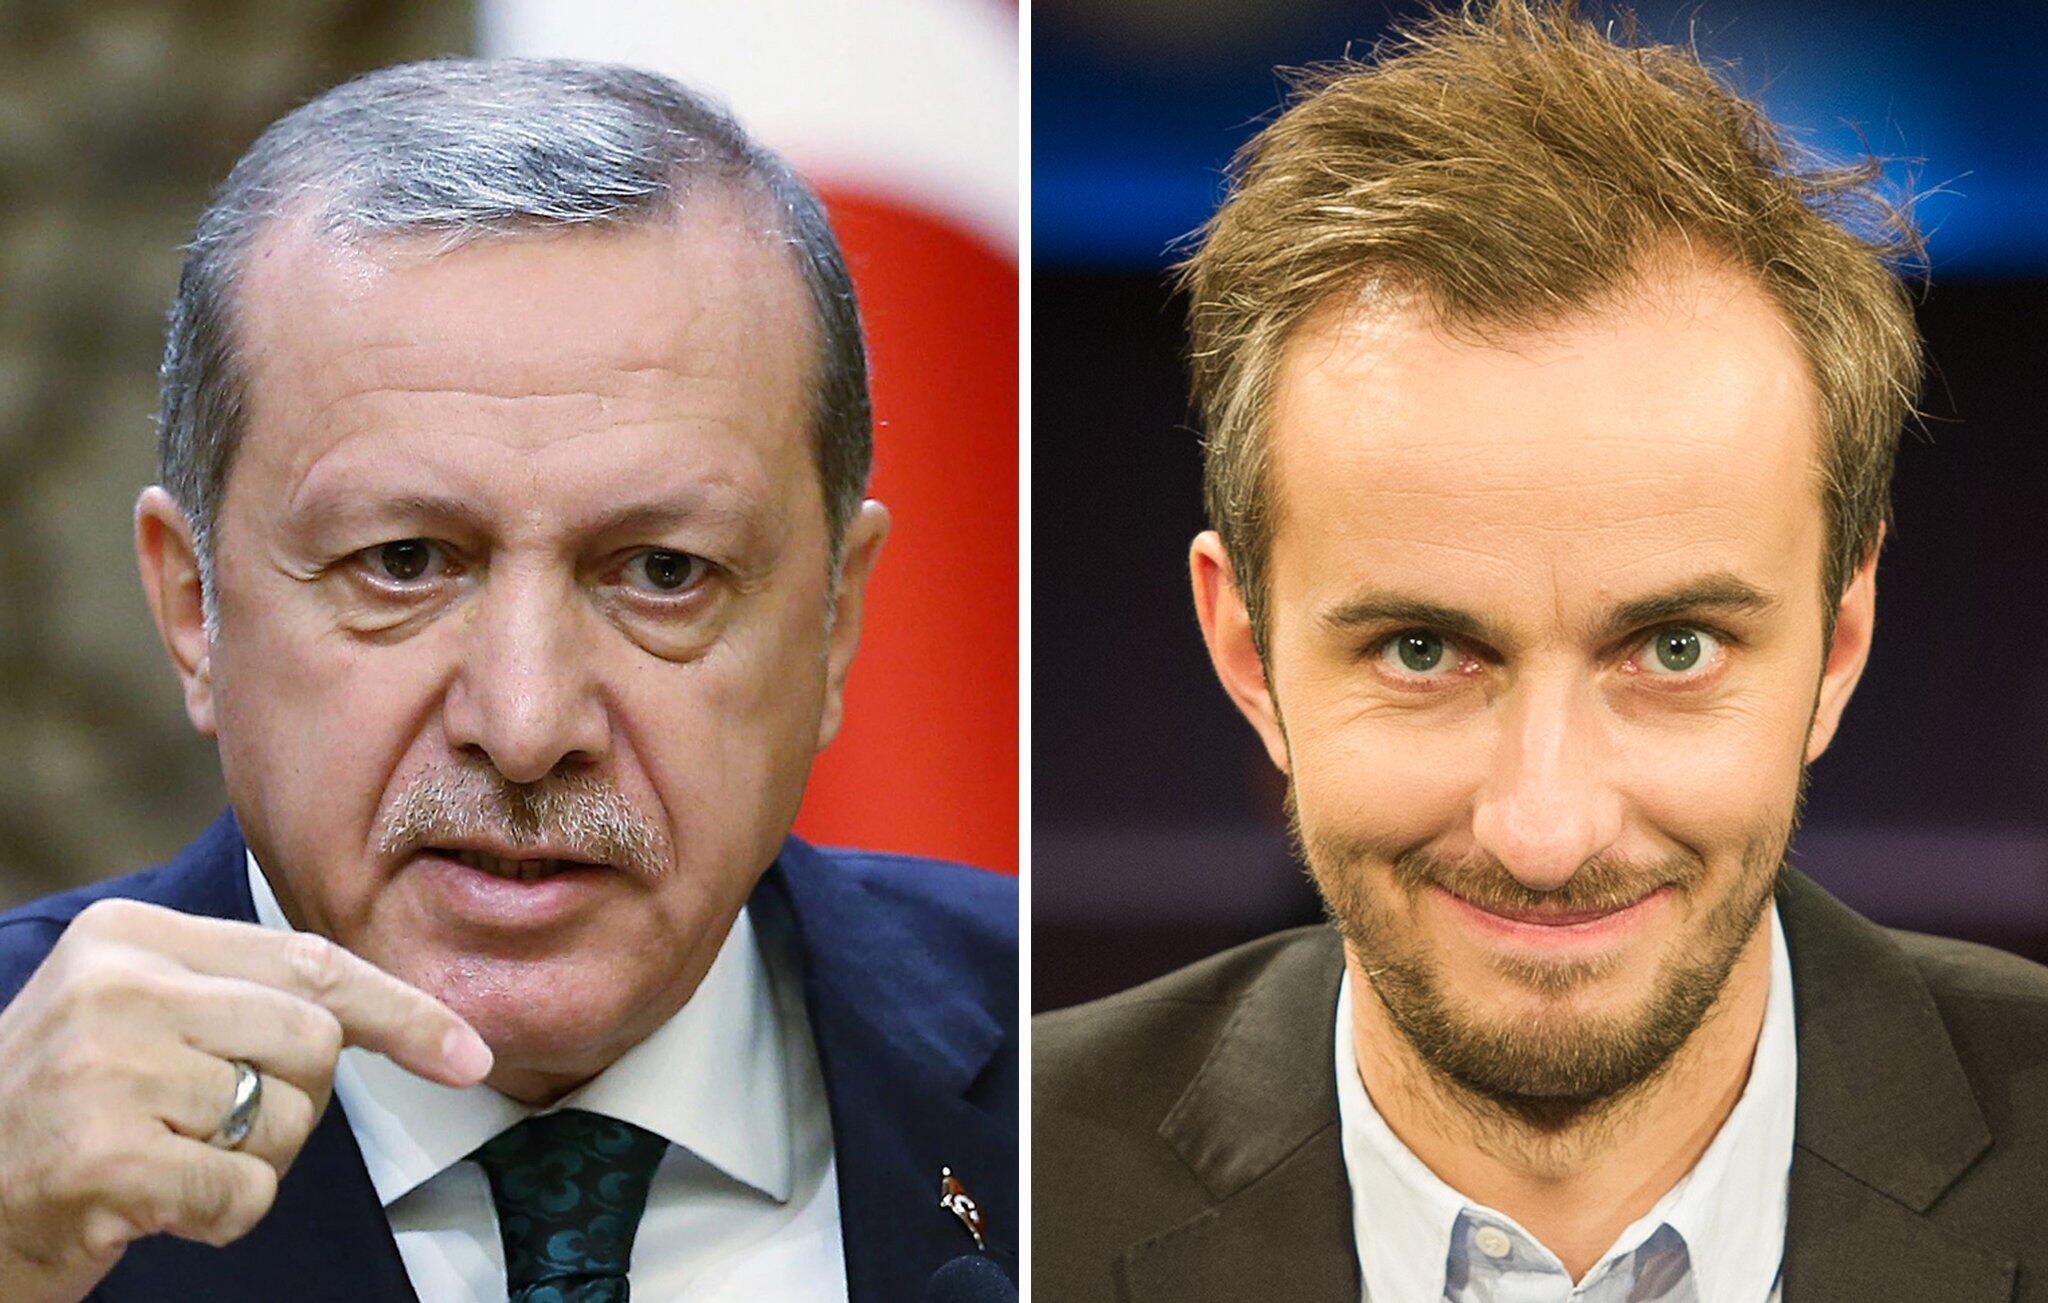 Bild zu Recep Tayyip Erdogan Jan Böhmermann.